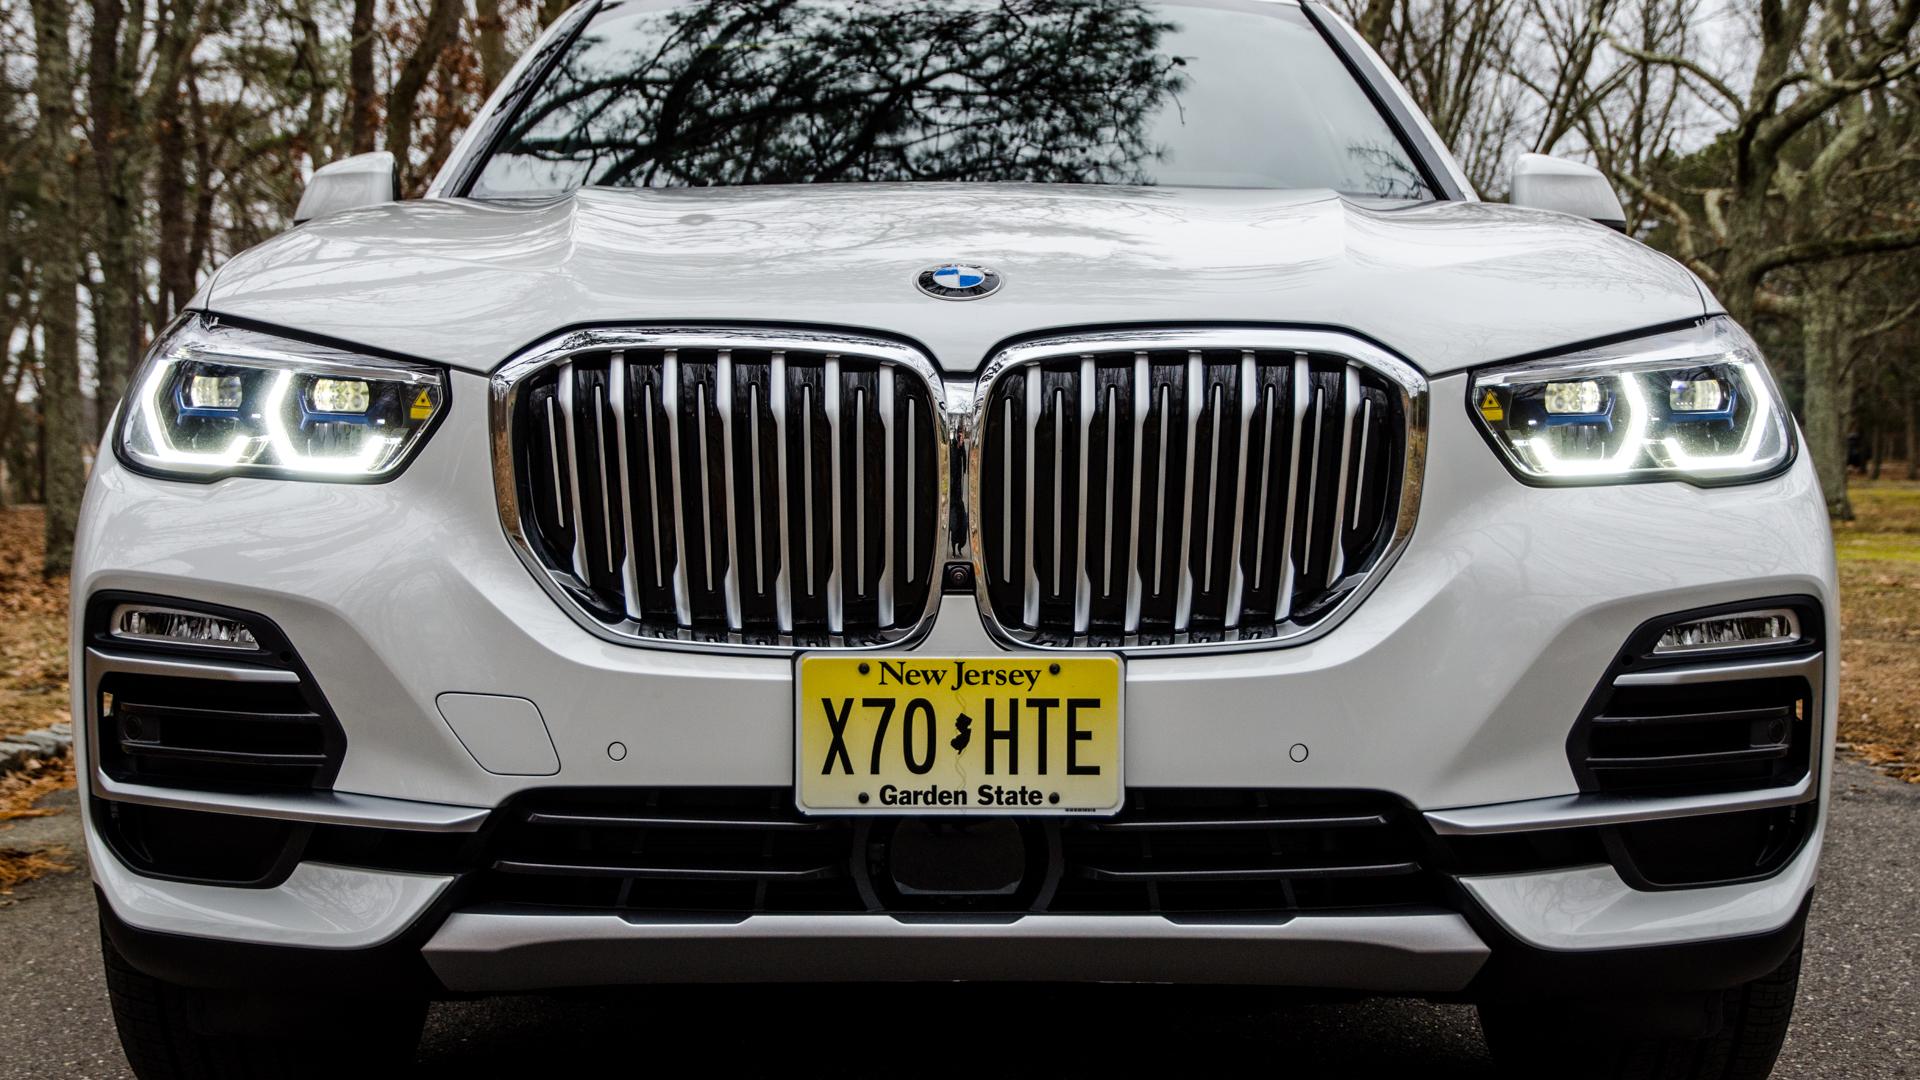 TEST DRIVE: 2019 BMW X5 xDrive40i -- Bavaria's Best SUV